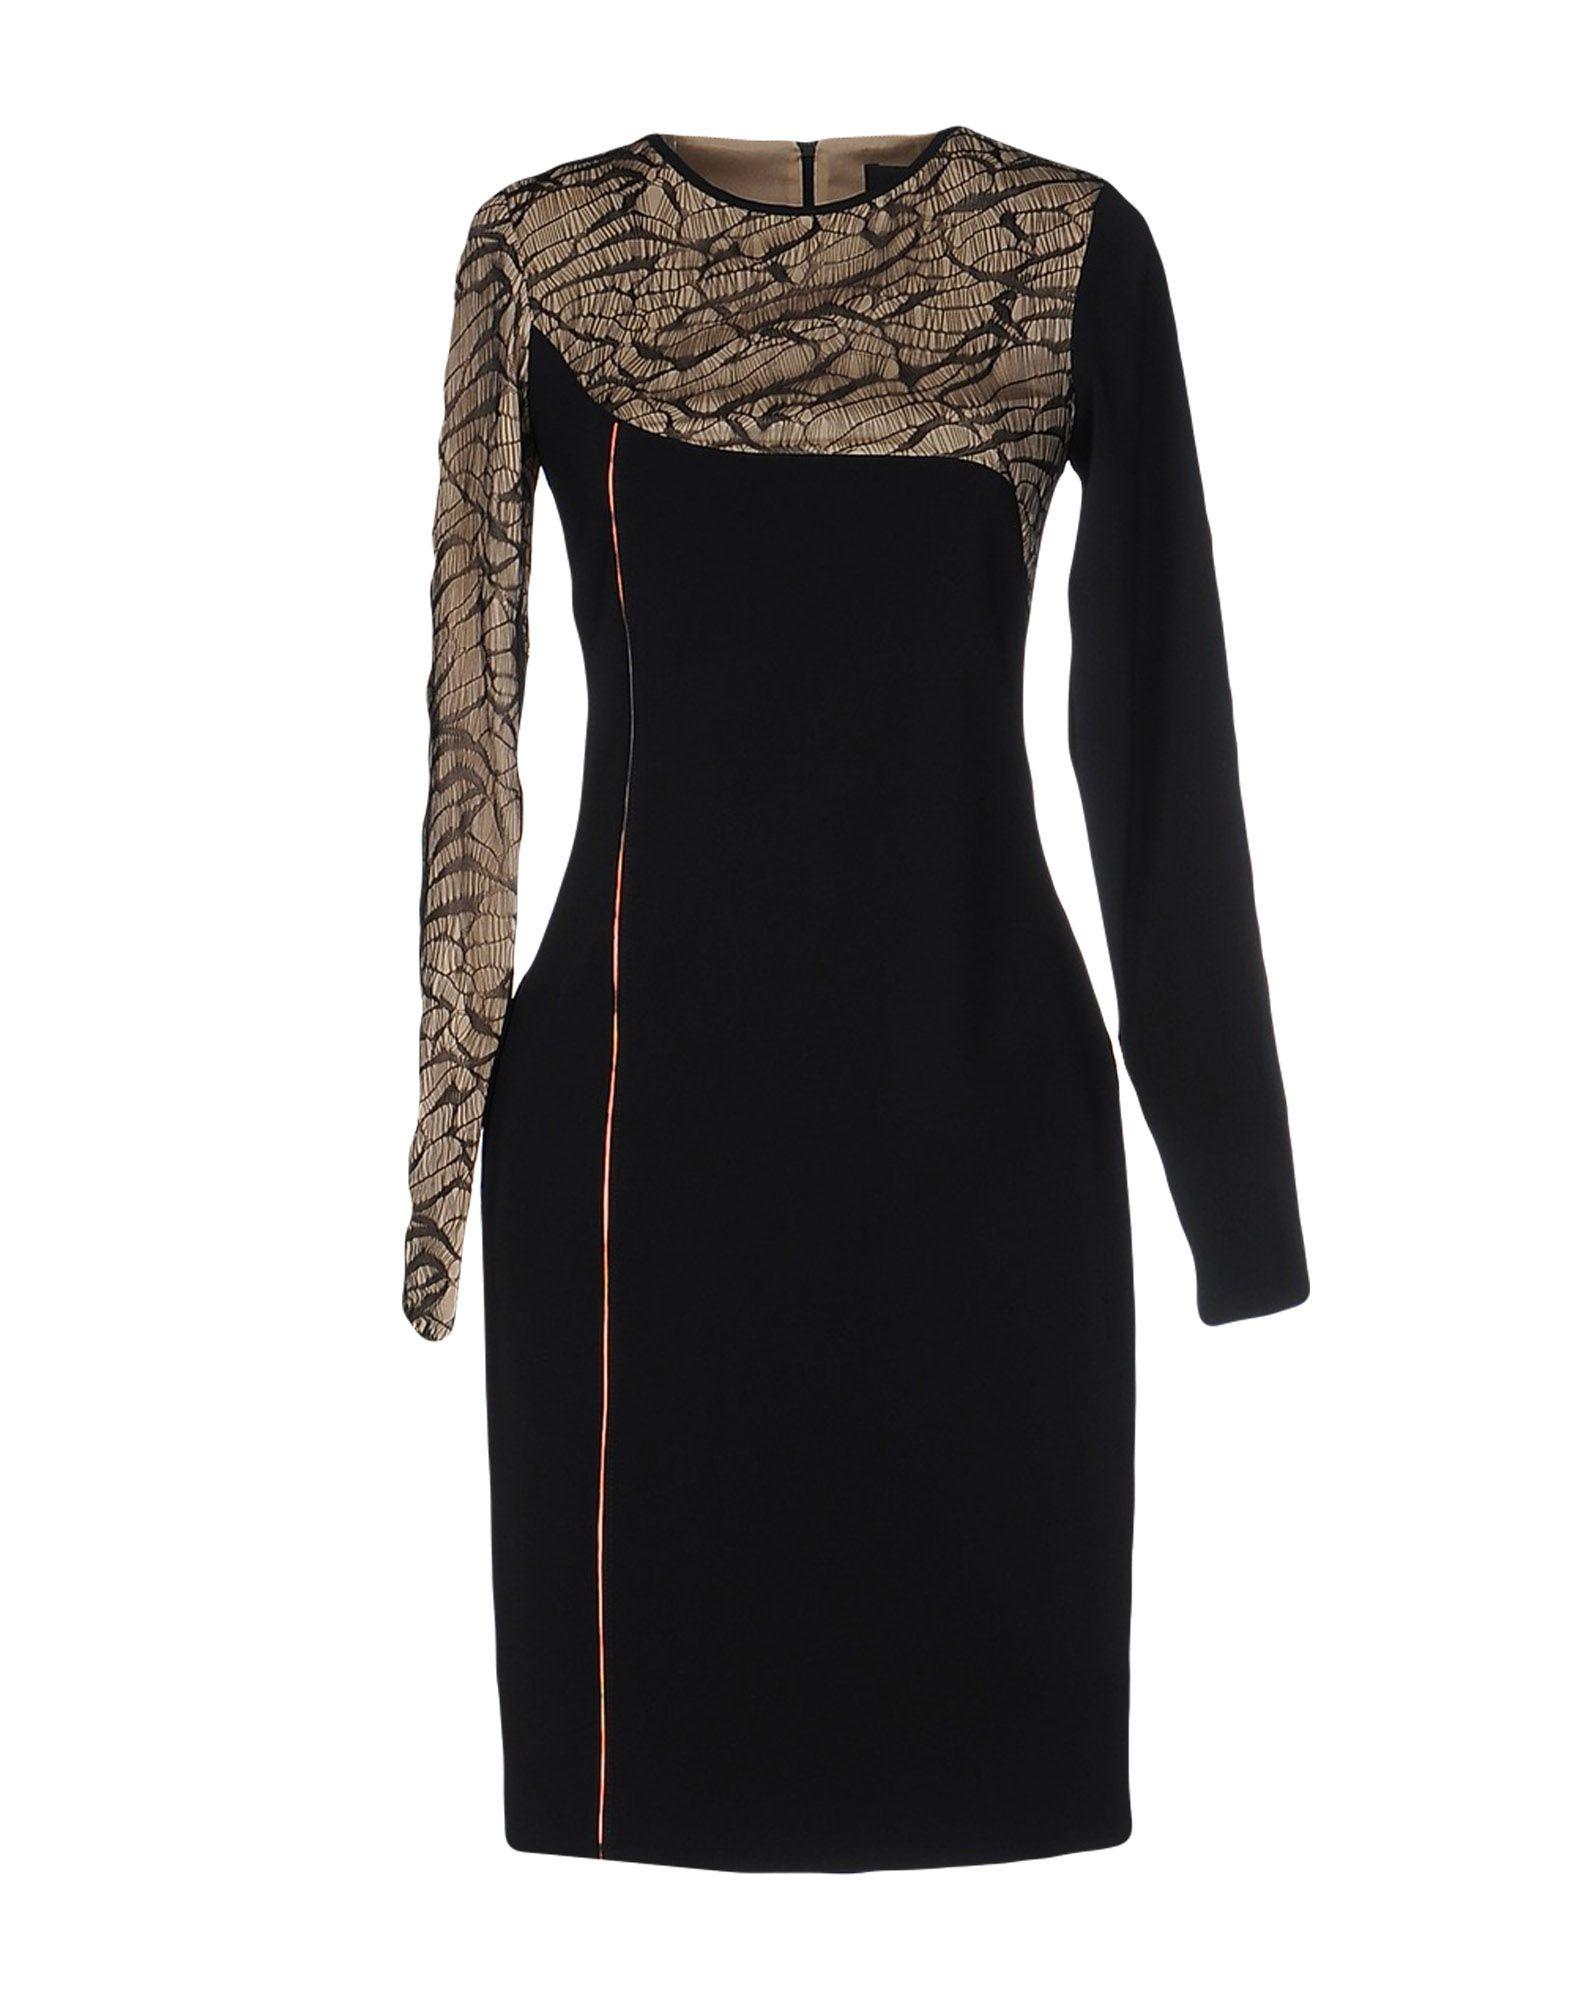 CRISTIANO BURANI Short Dress in Black